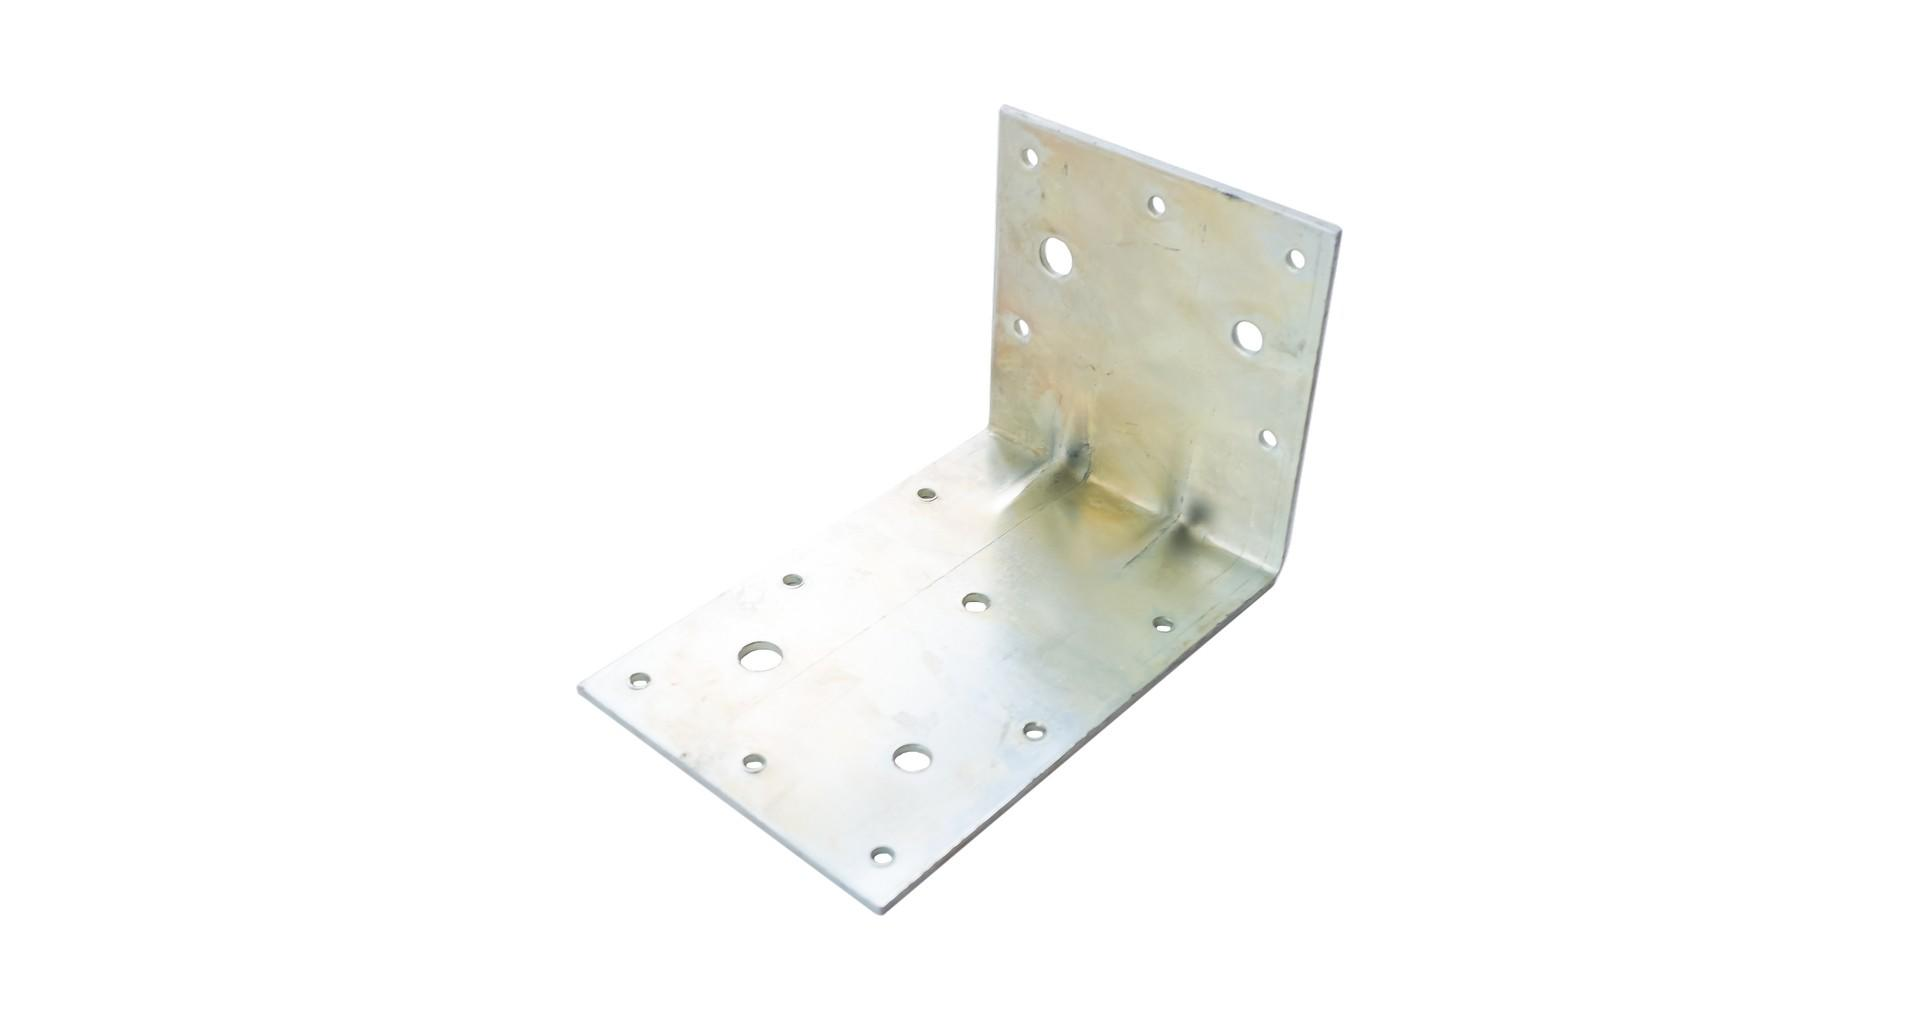 Уголок Укрметиз - 150 х 100 х 100 мм 2